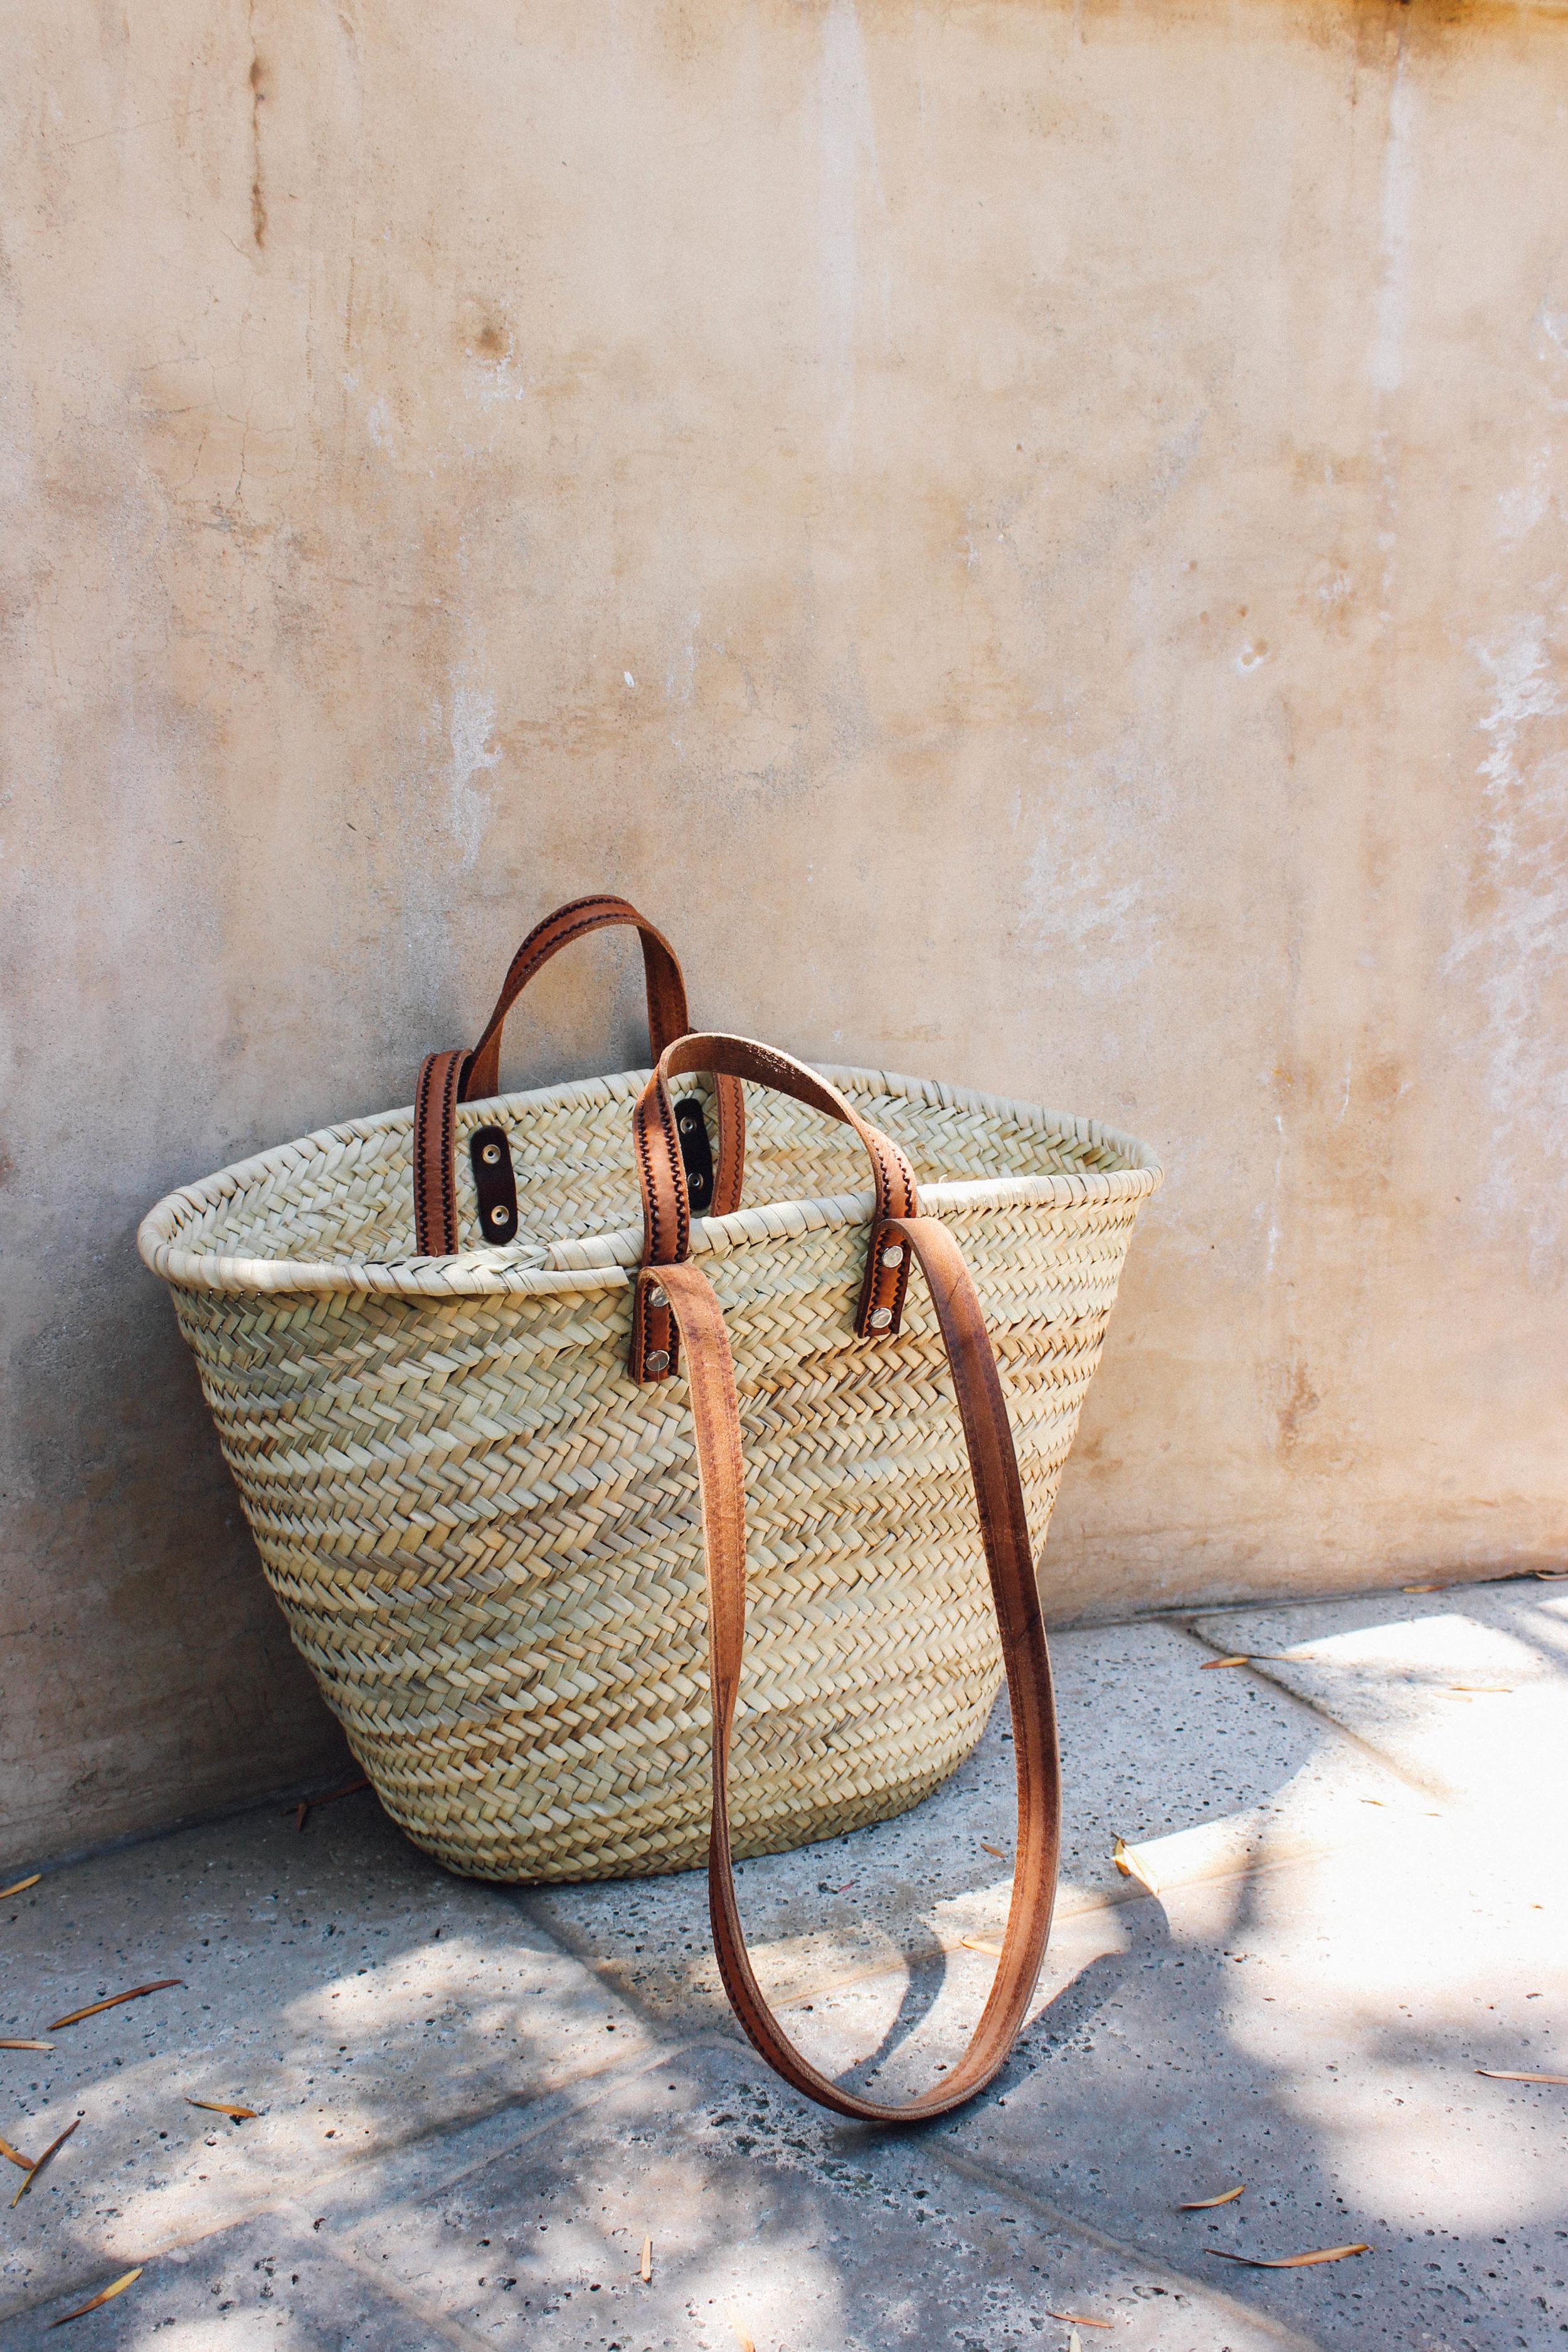 Christy Dawn Paloma Dress and Handmade Moroccan Straw Tote Bag. | TaylorKristiina.com